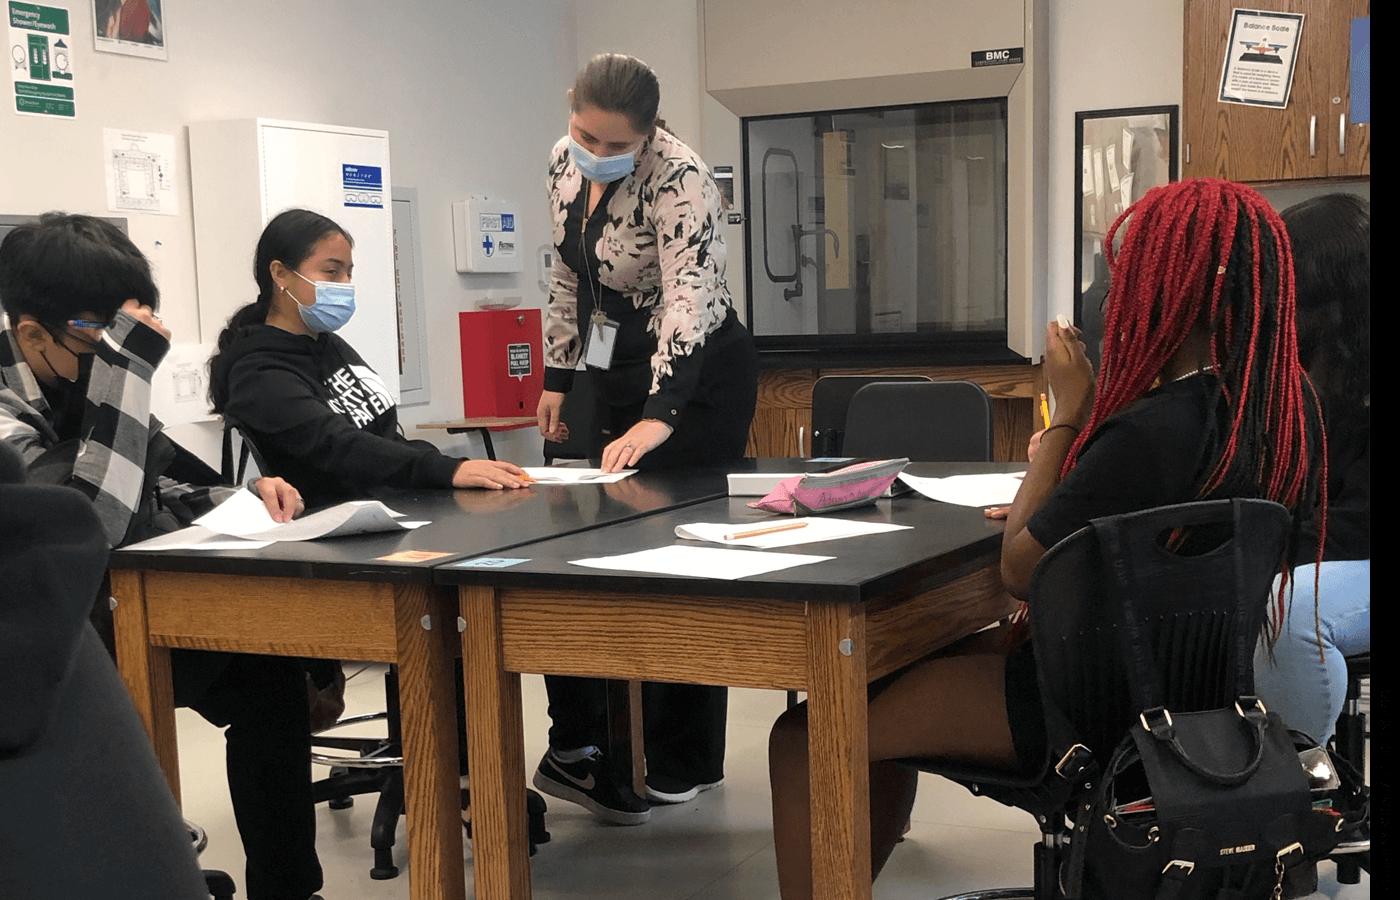 Begaeta Ahmic, a math teacher at Roosevelt High School, helps students with their work.